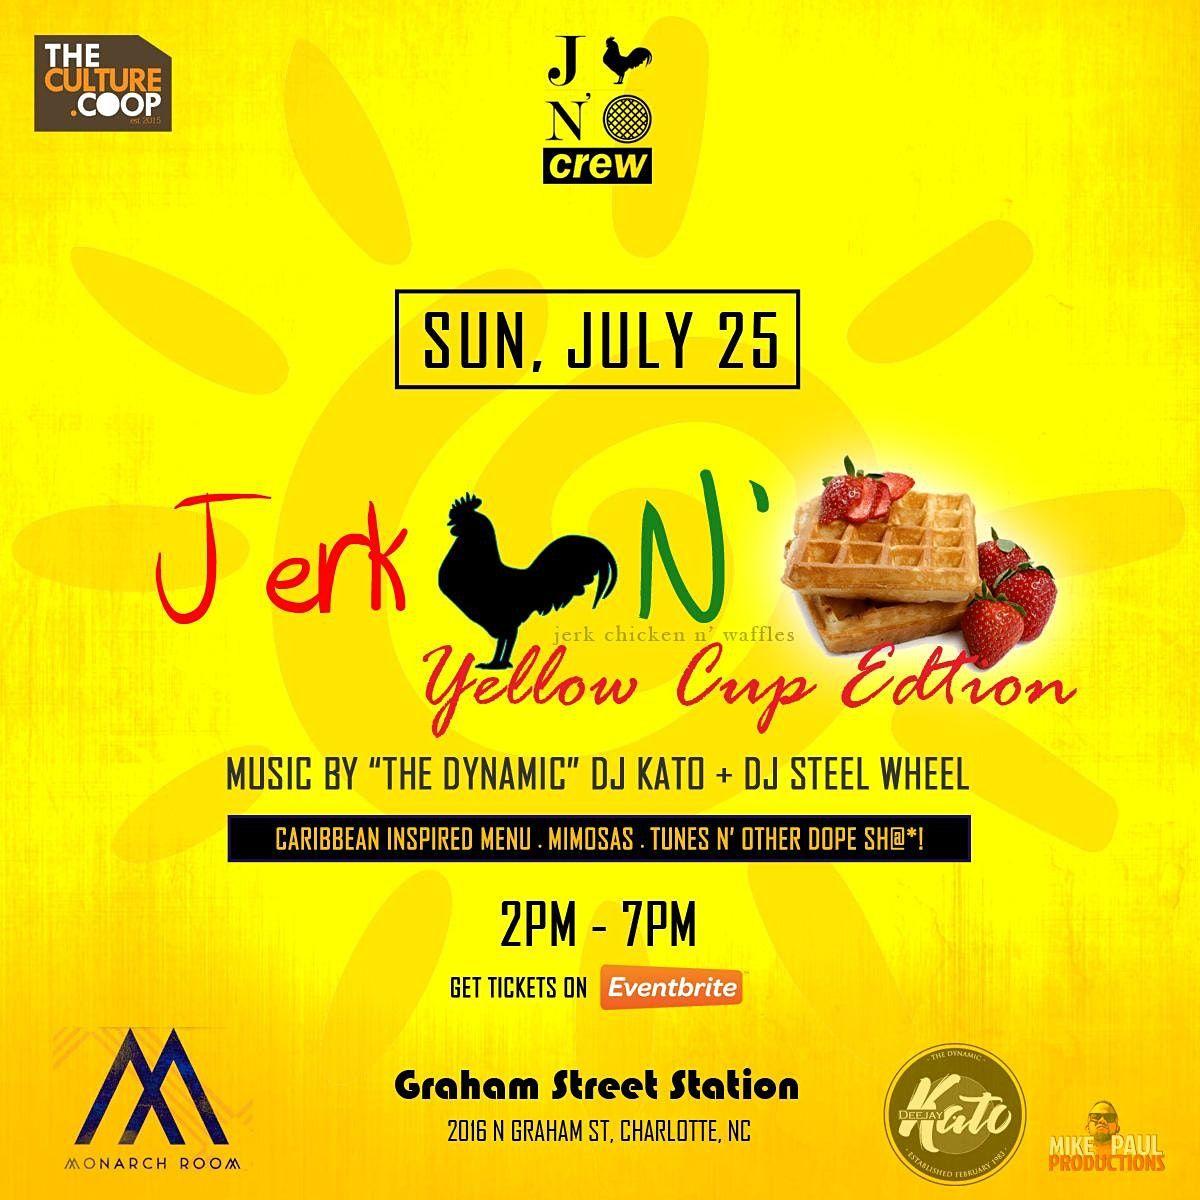 Jerk Chicken N' Waffles Brunch: Yellow Cup Edition!